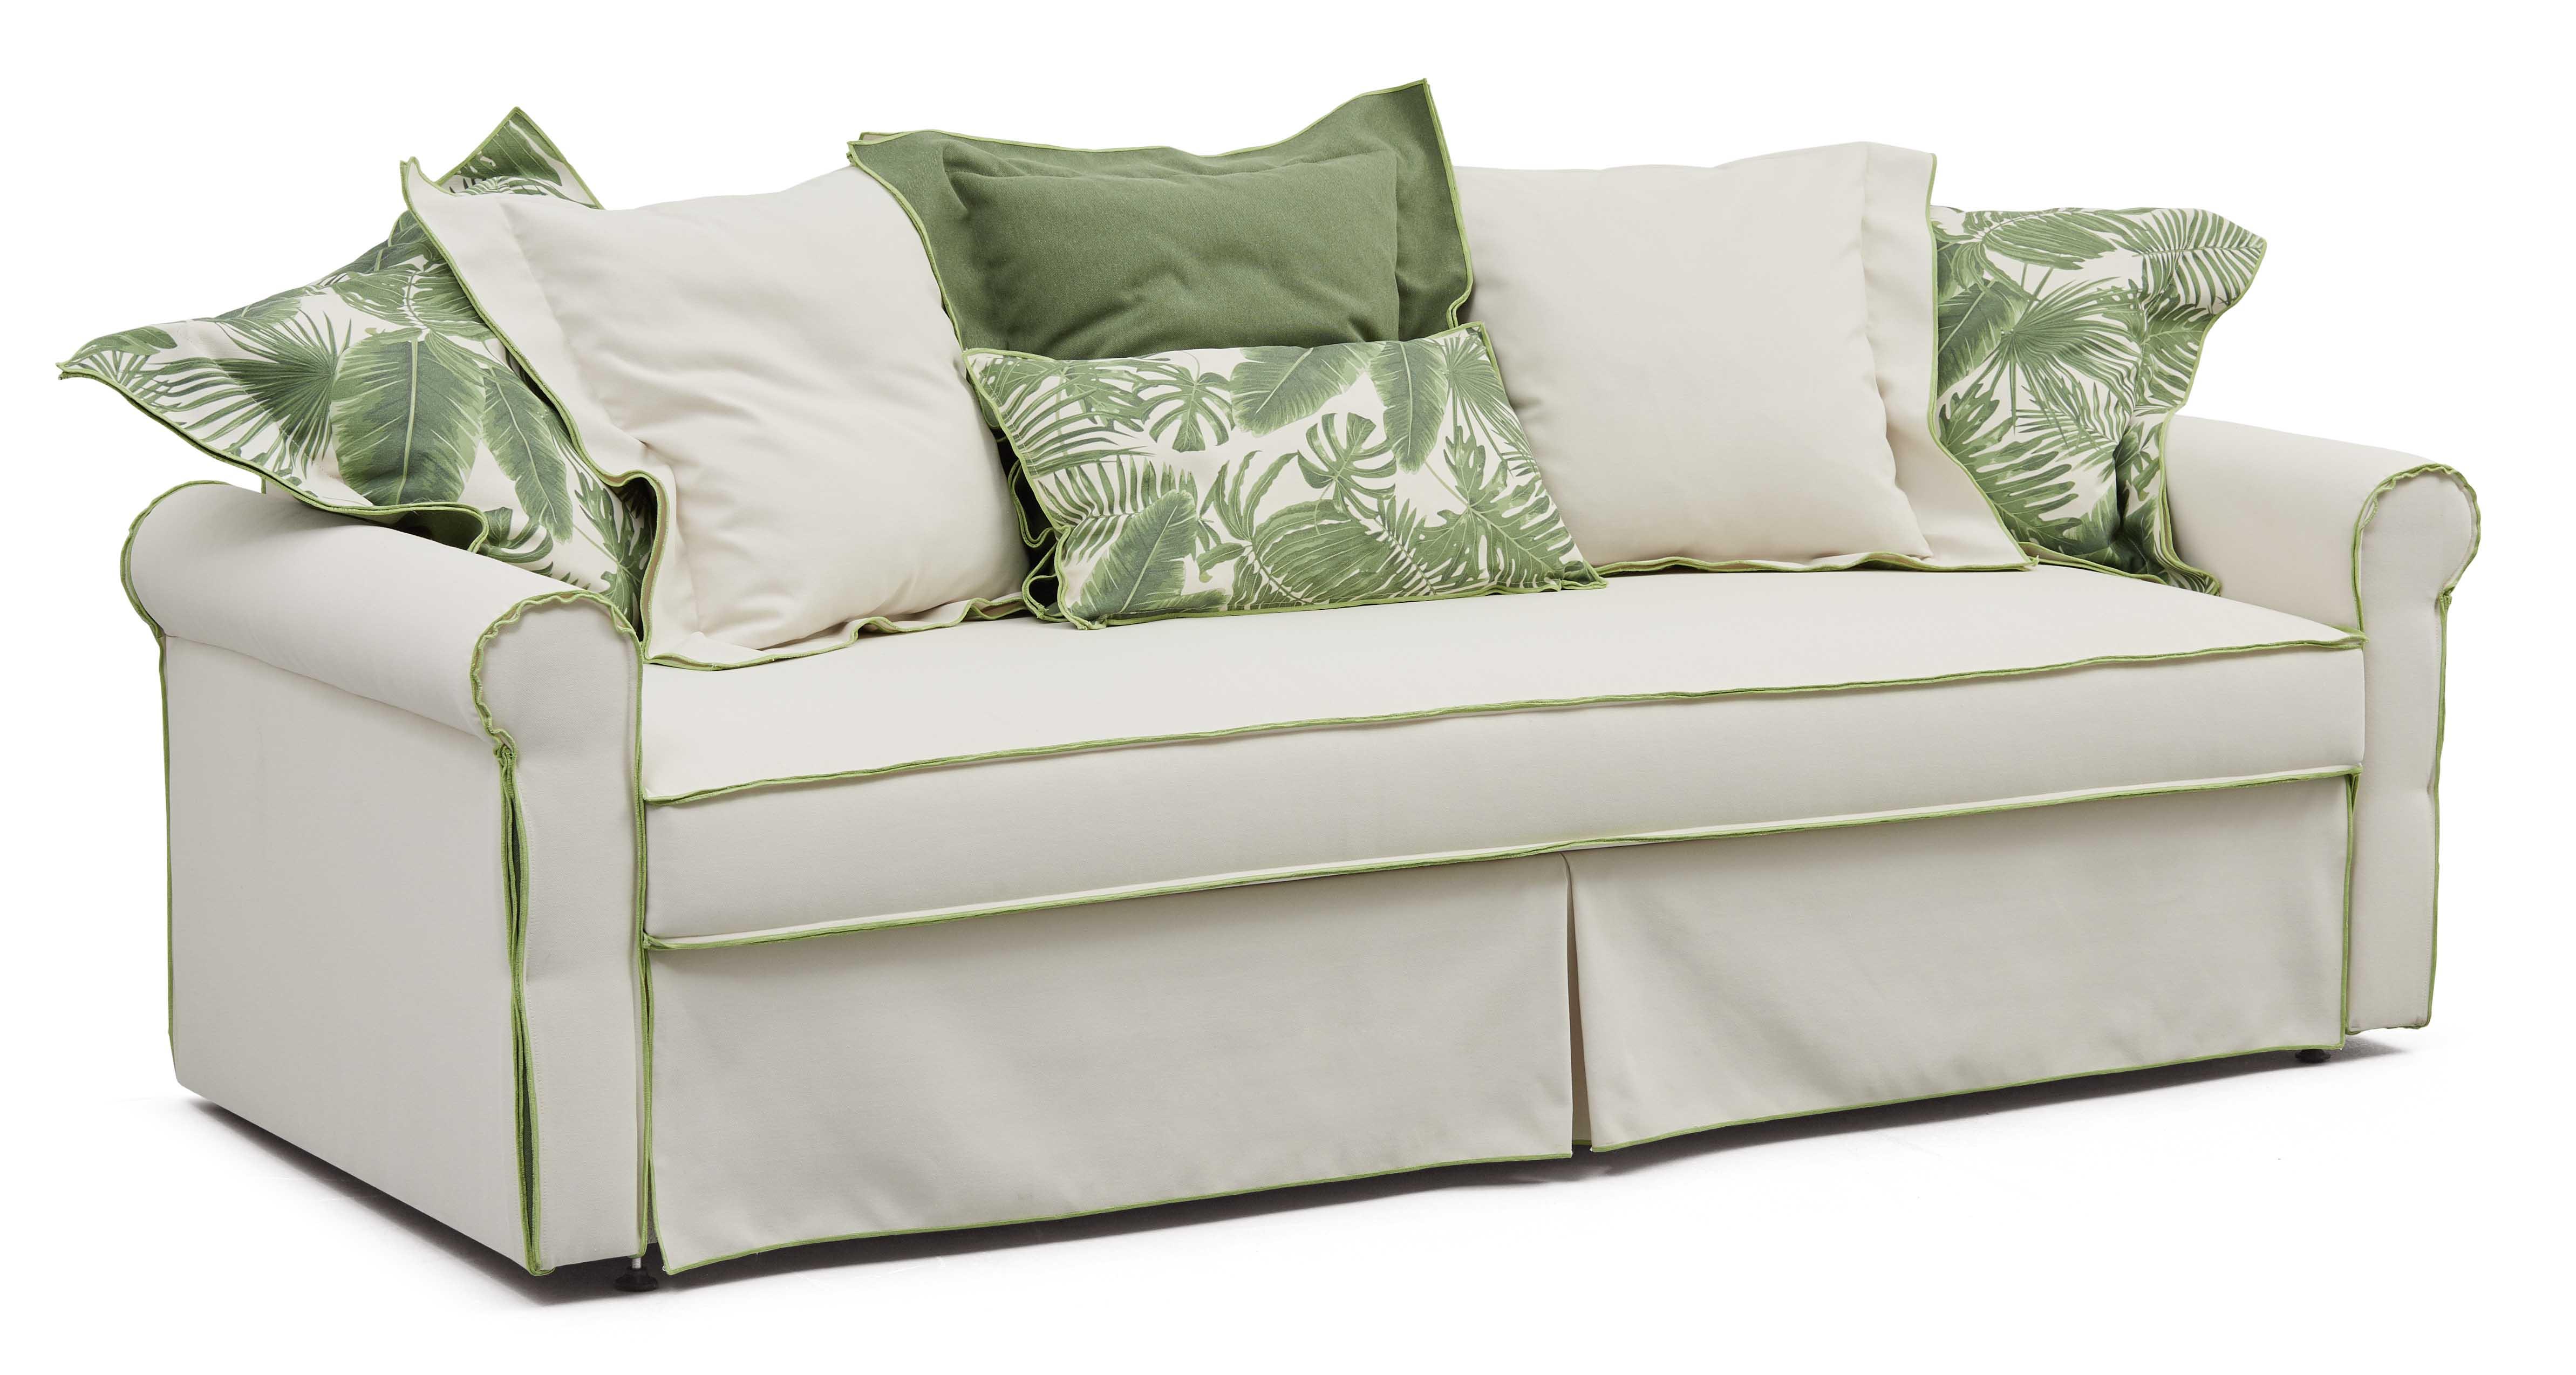 spring sofa bed kanapes krevati 2